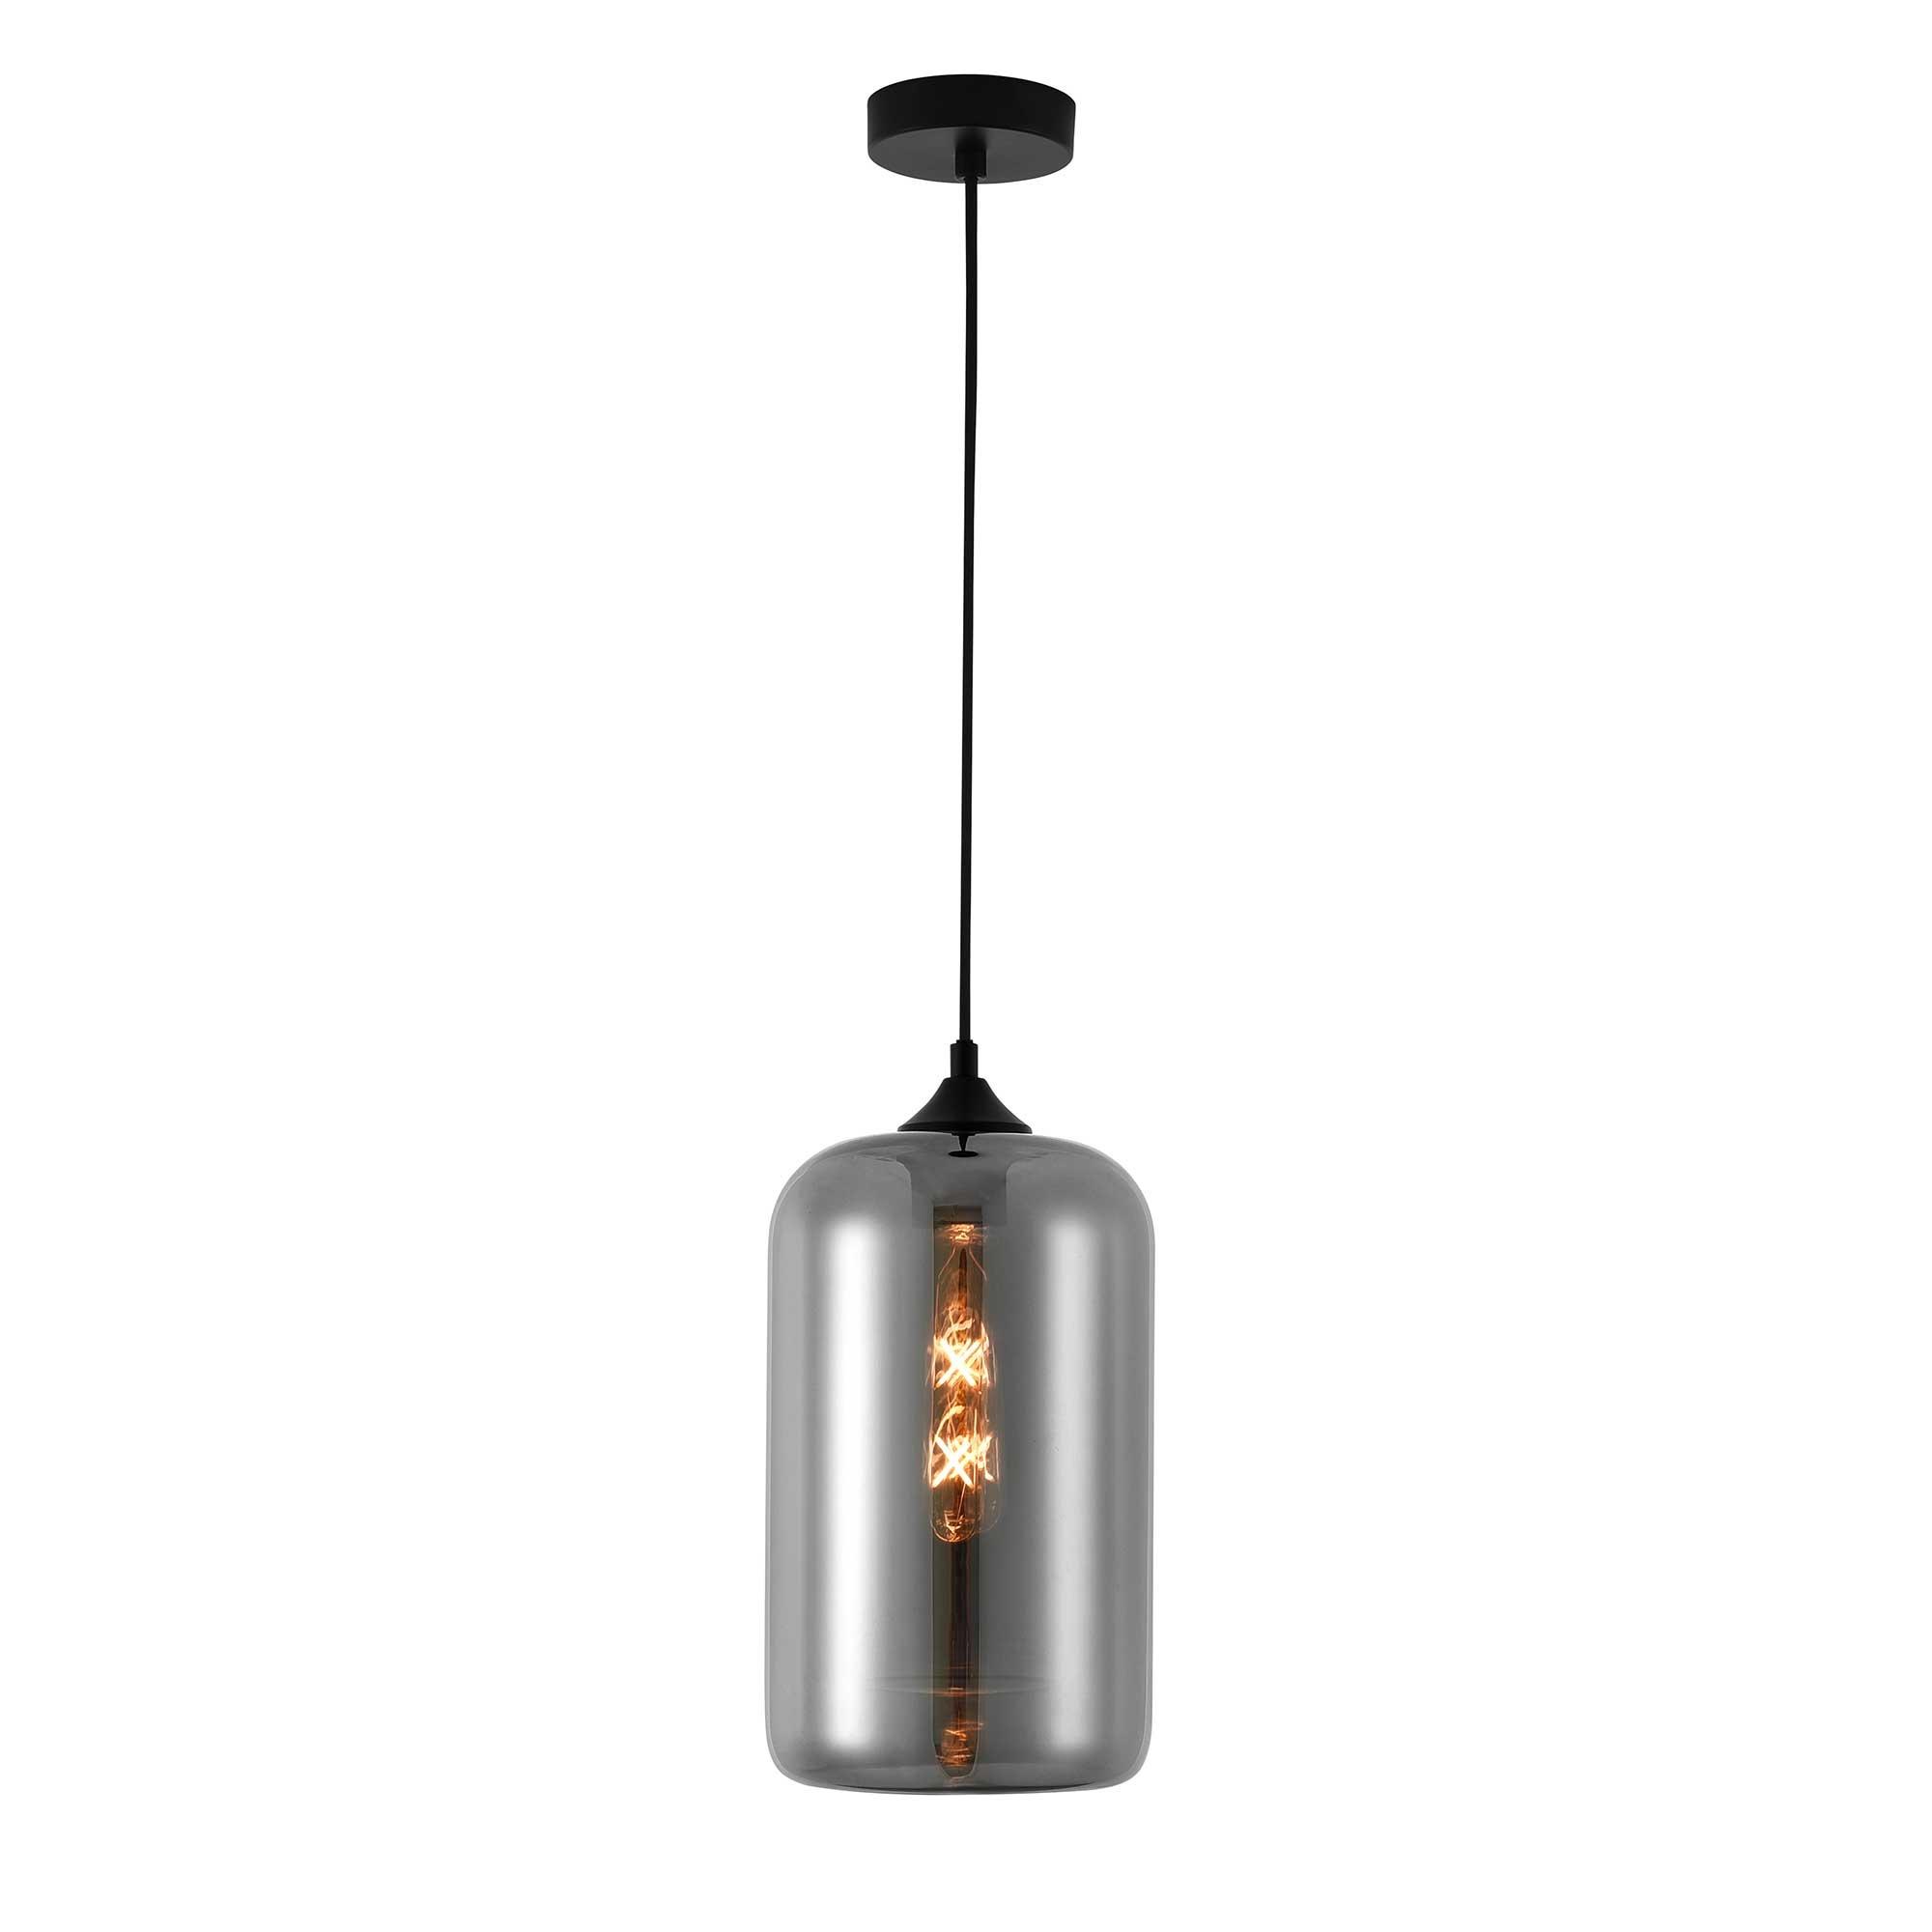 Artdelight Hanglamp Botany Ø 18 cm rook glas zwart